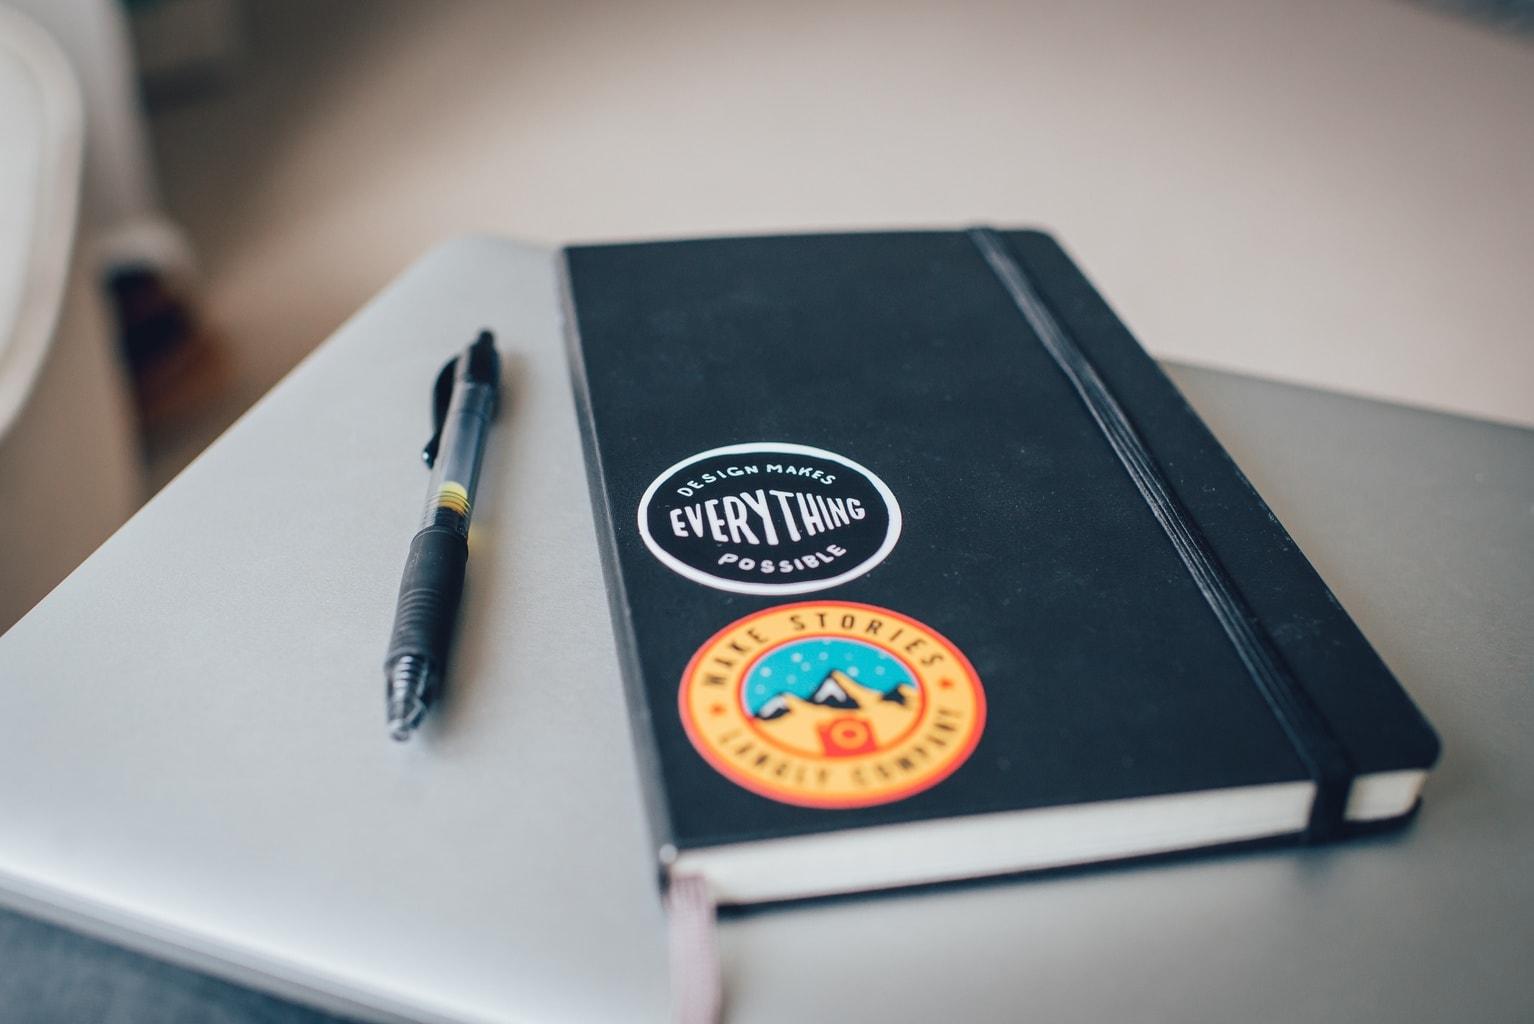 black pen and black journal/planner